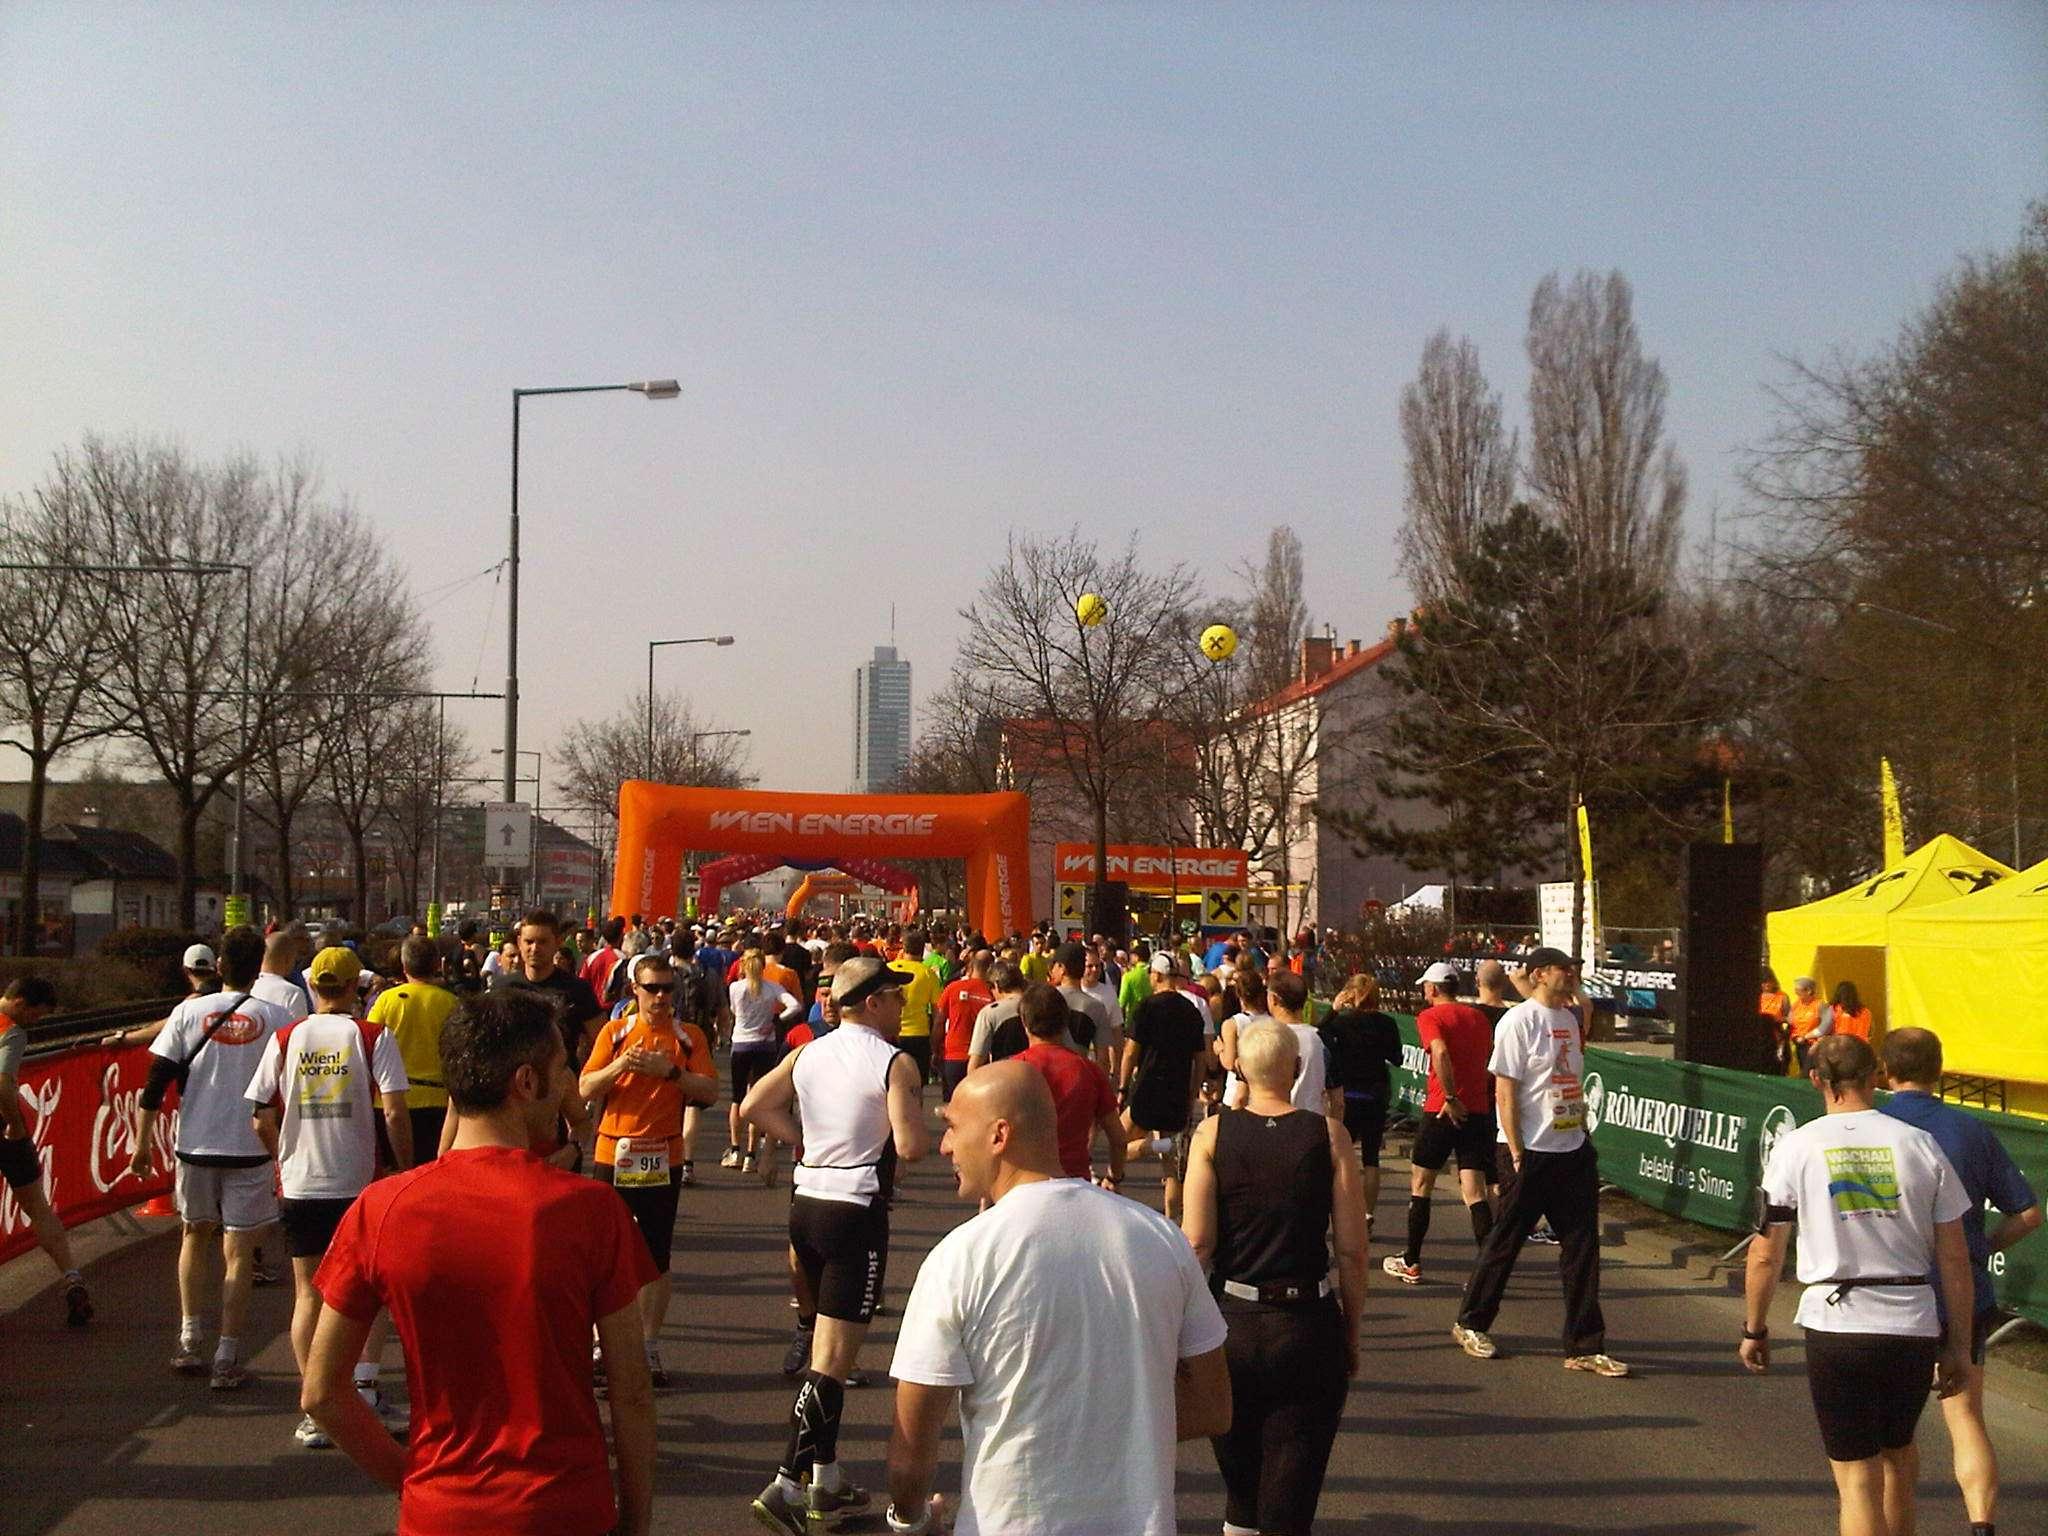 Wien Energy halbmarathon – before start